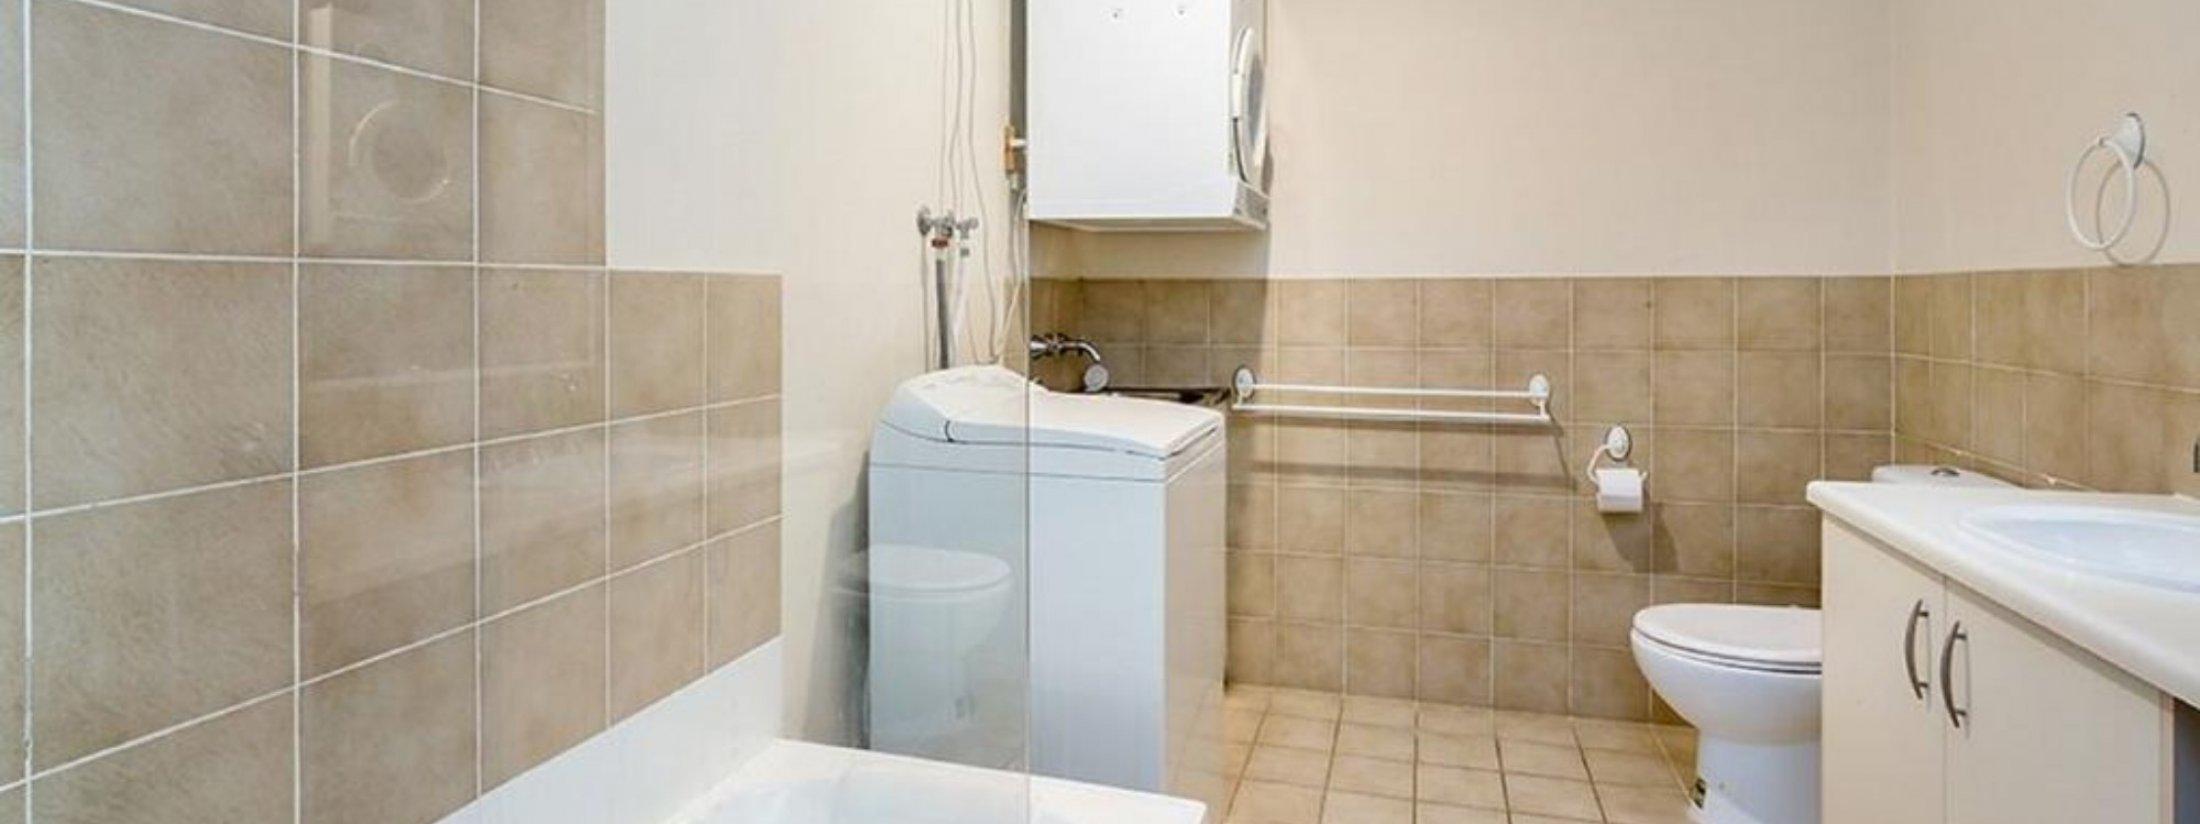 Heathers Hideaway - Byron Bay - Bathroom